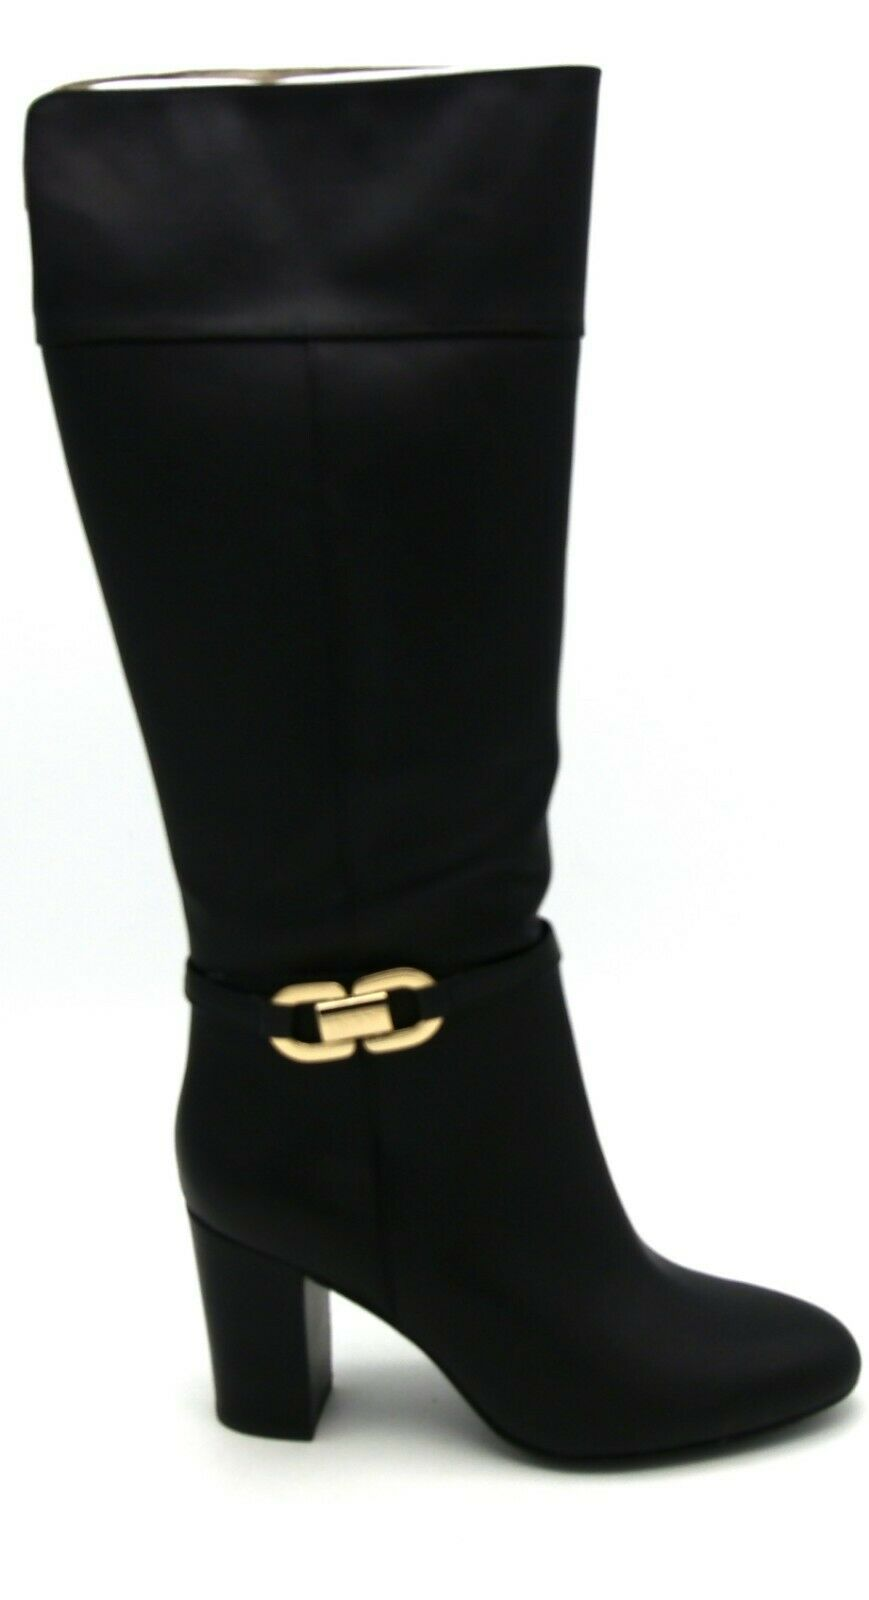 J7948 New New New Women's Joy & Iman Black Leather Knee High Boot 9 W 62831c